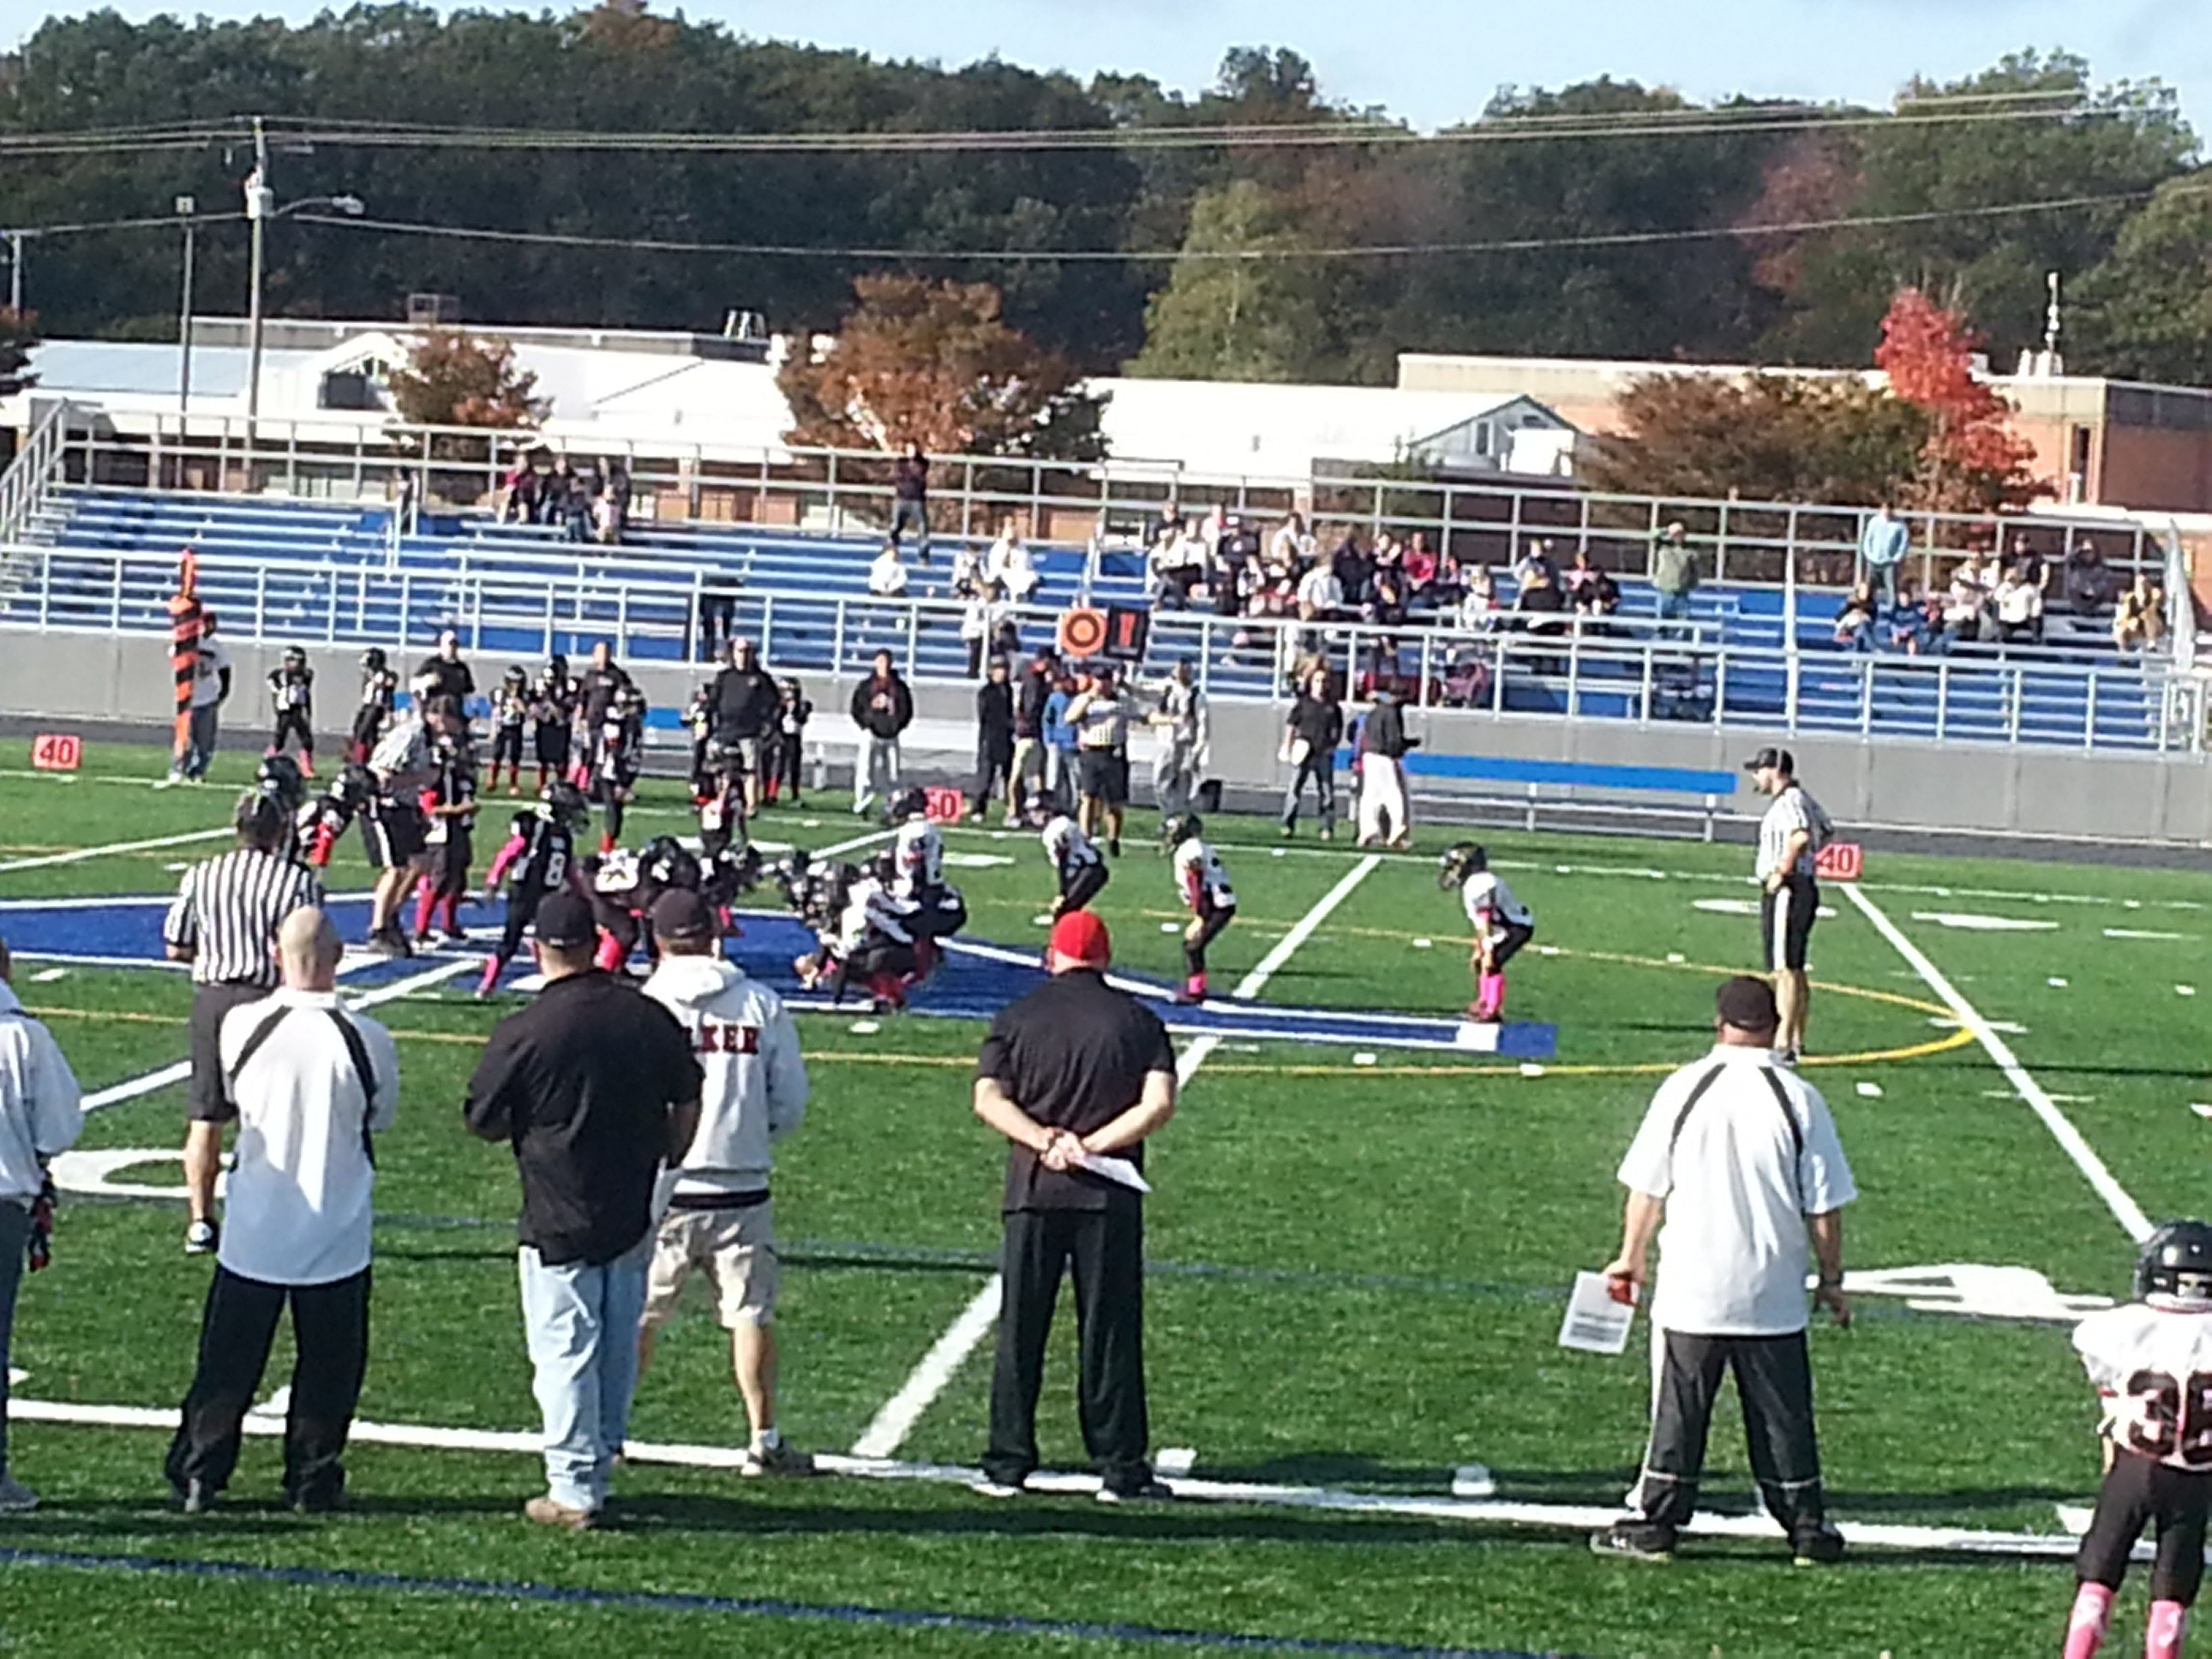 Scholarships for Kids Potential - Sports Program